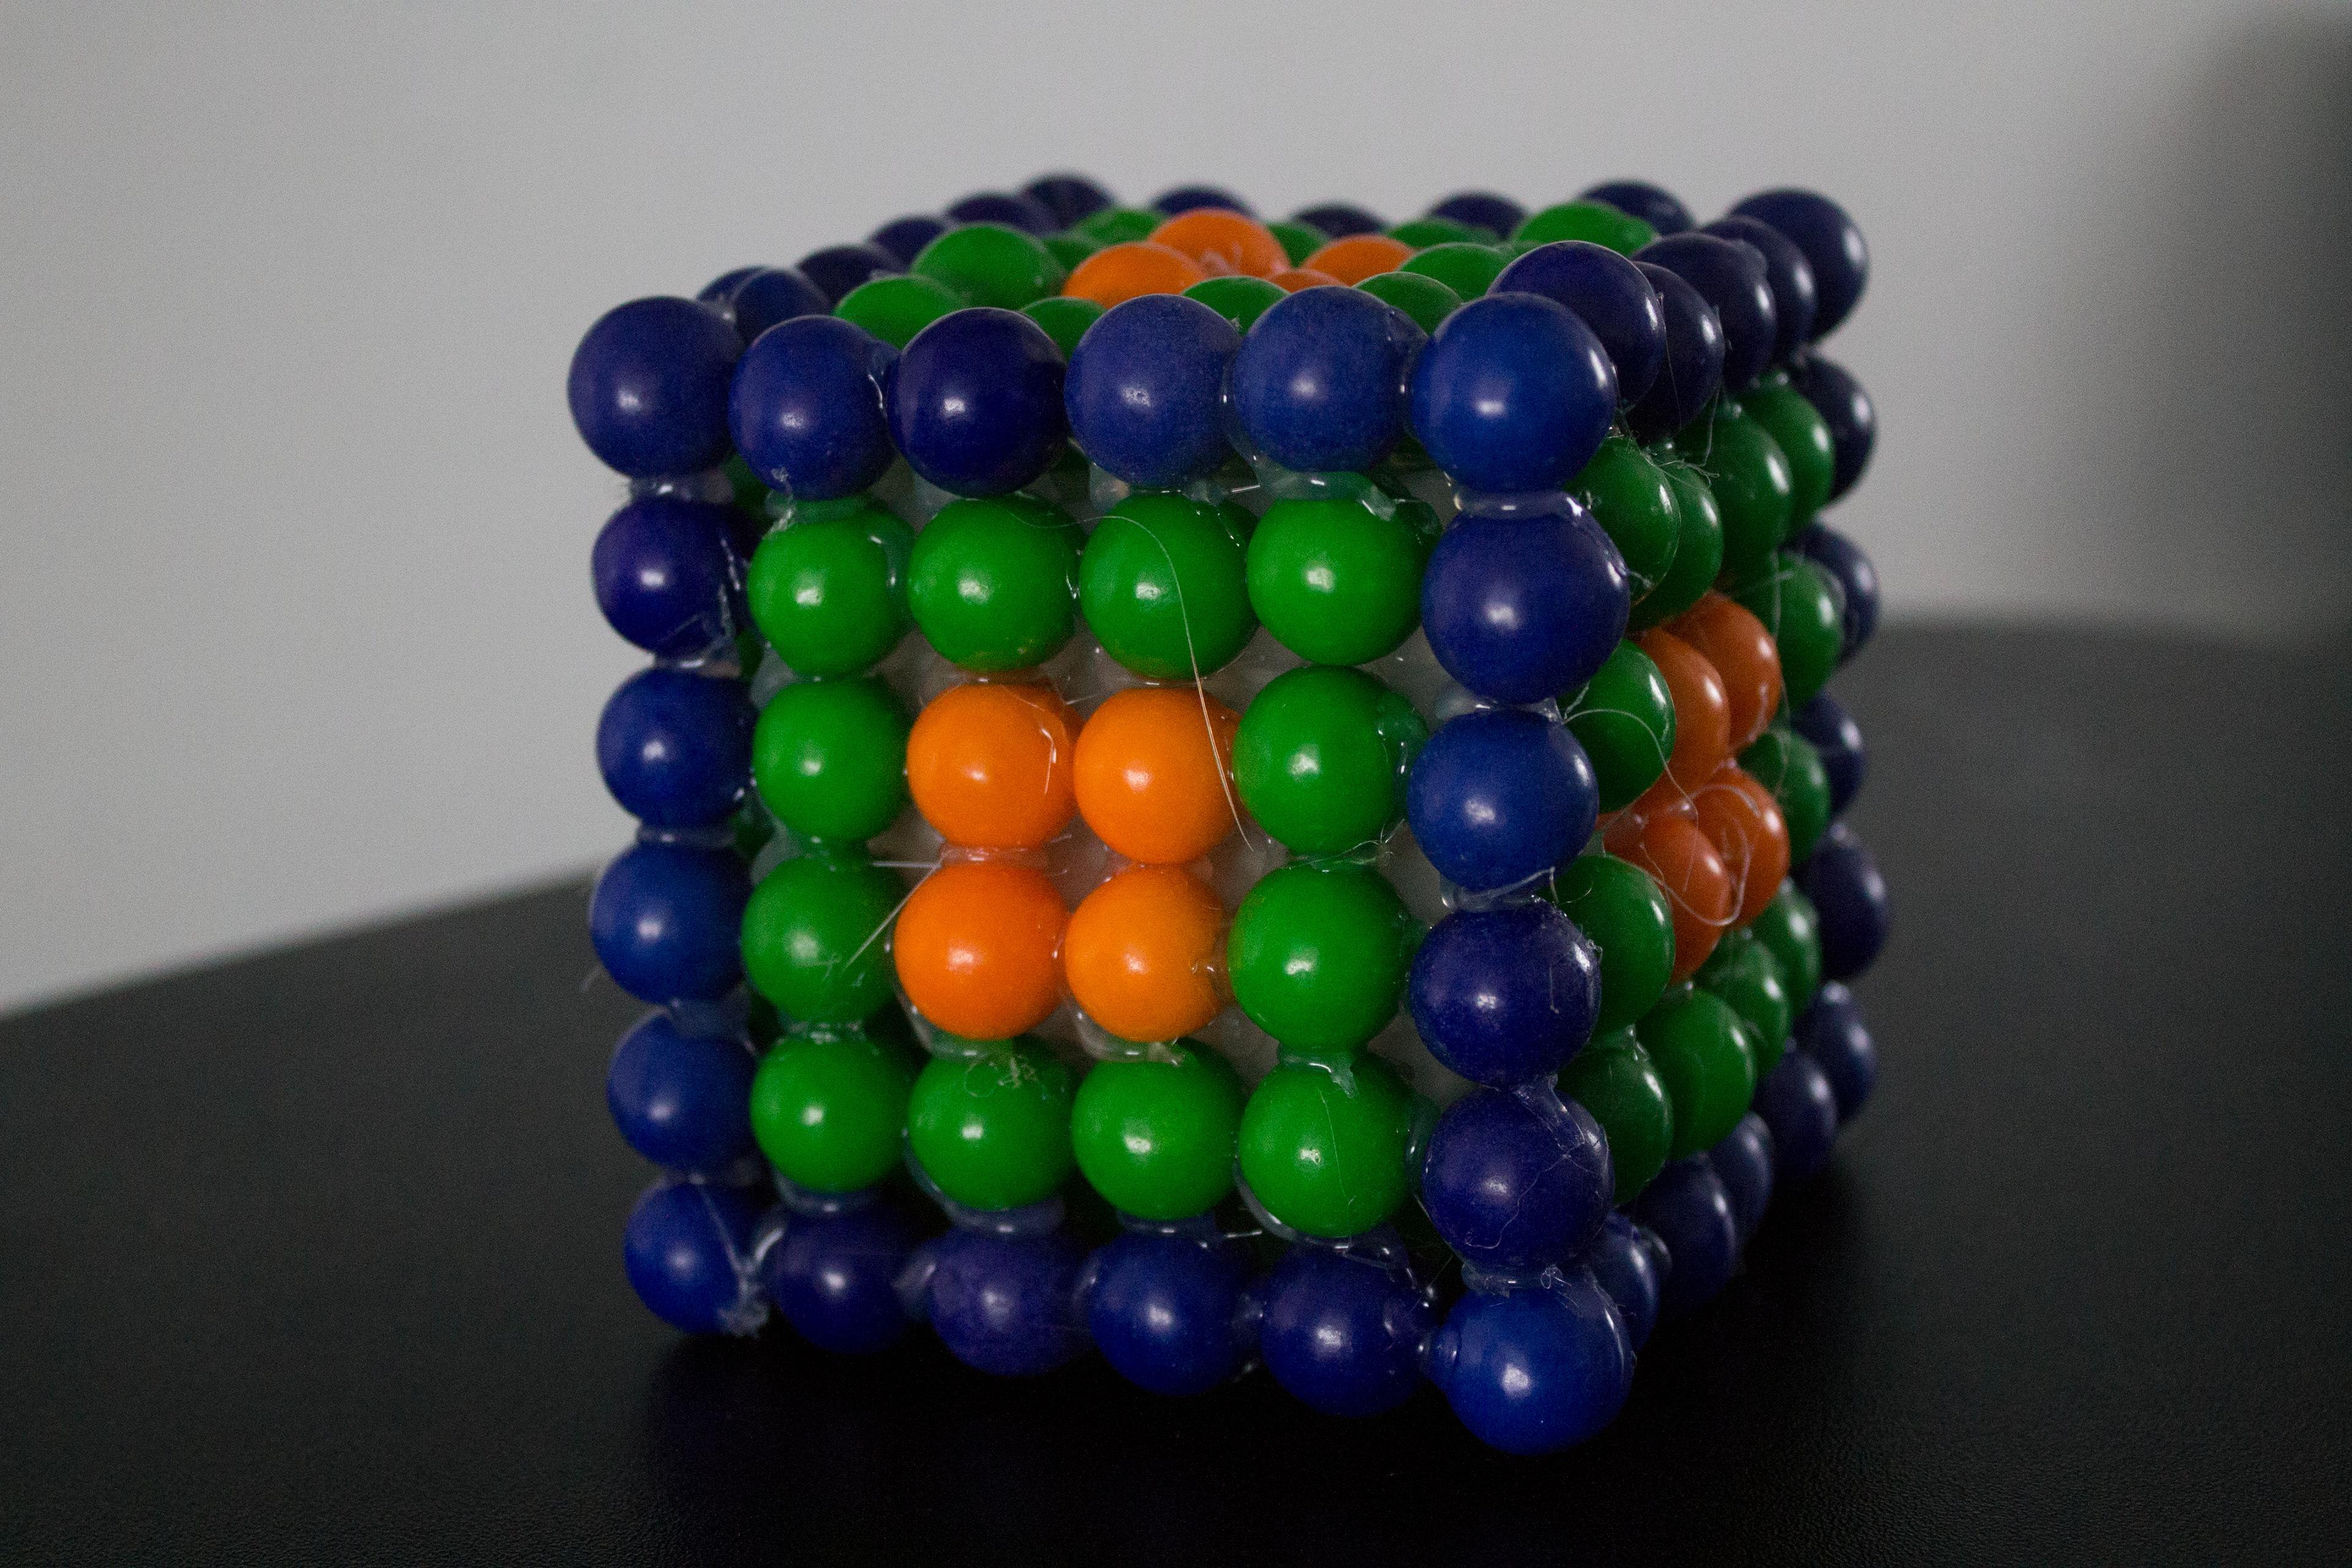 Constantine Mantis IV - Secondary Cube #3